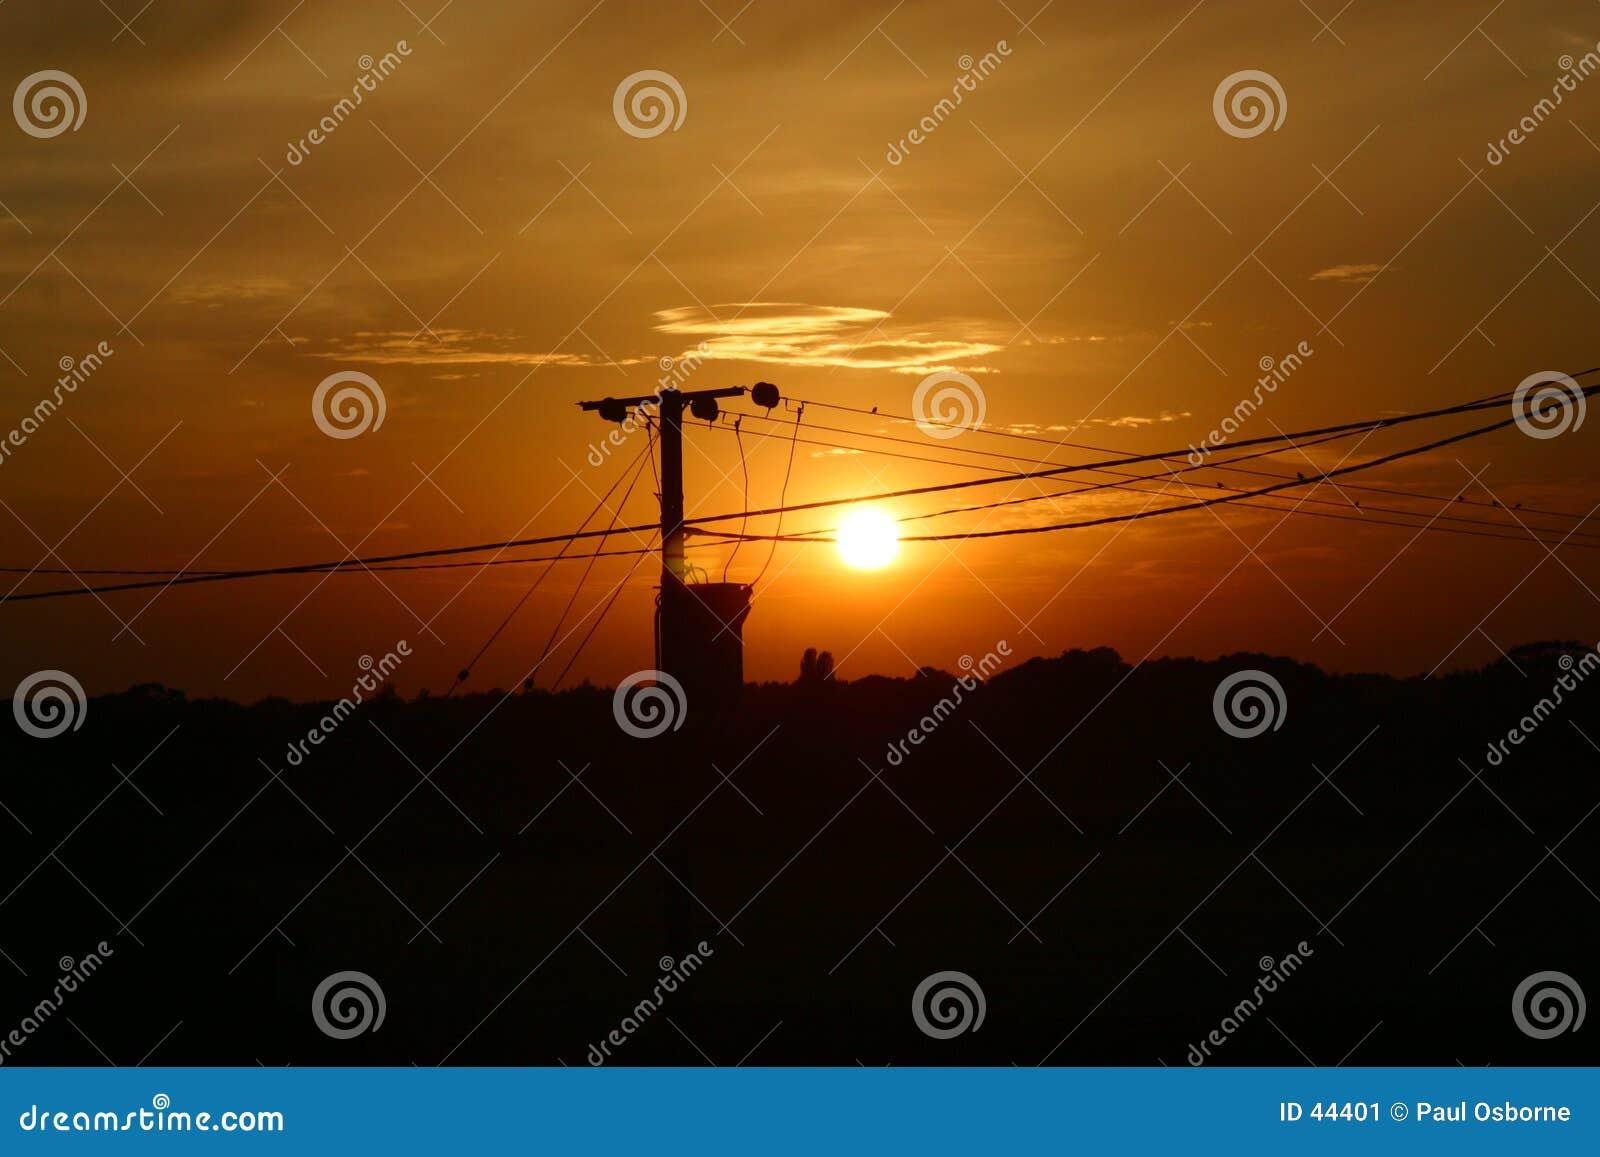 Töpfer Heigham Sonnenuntergang